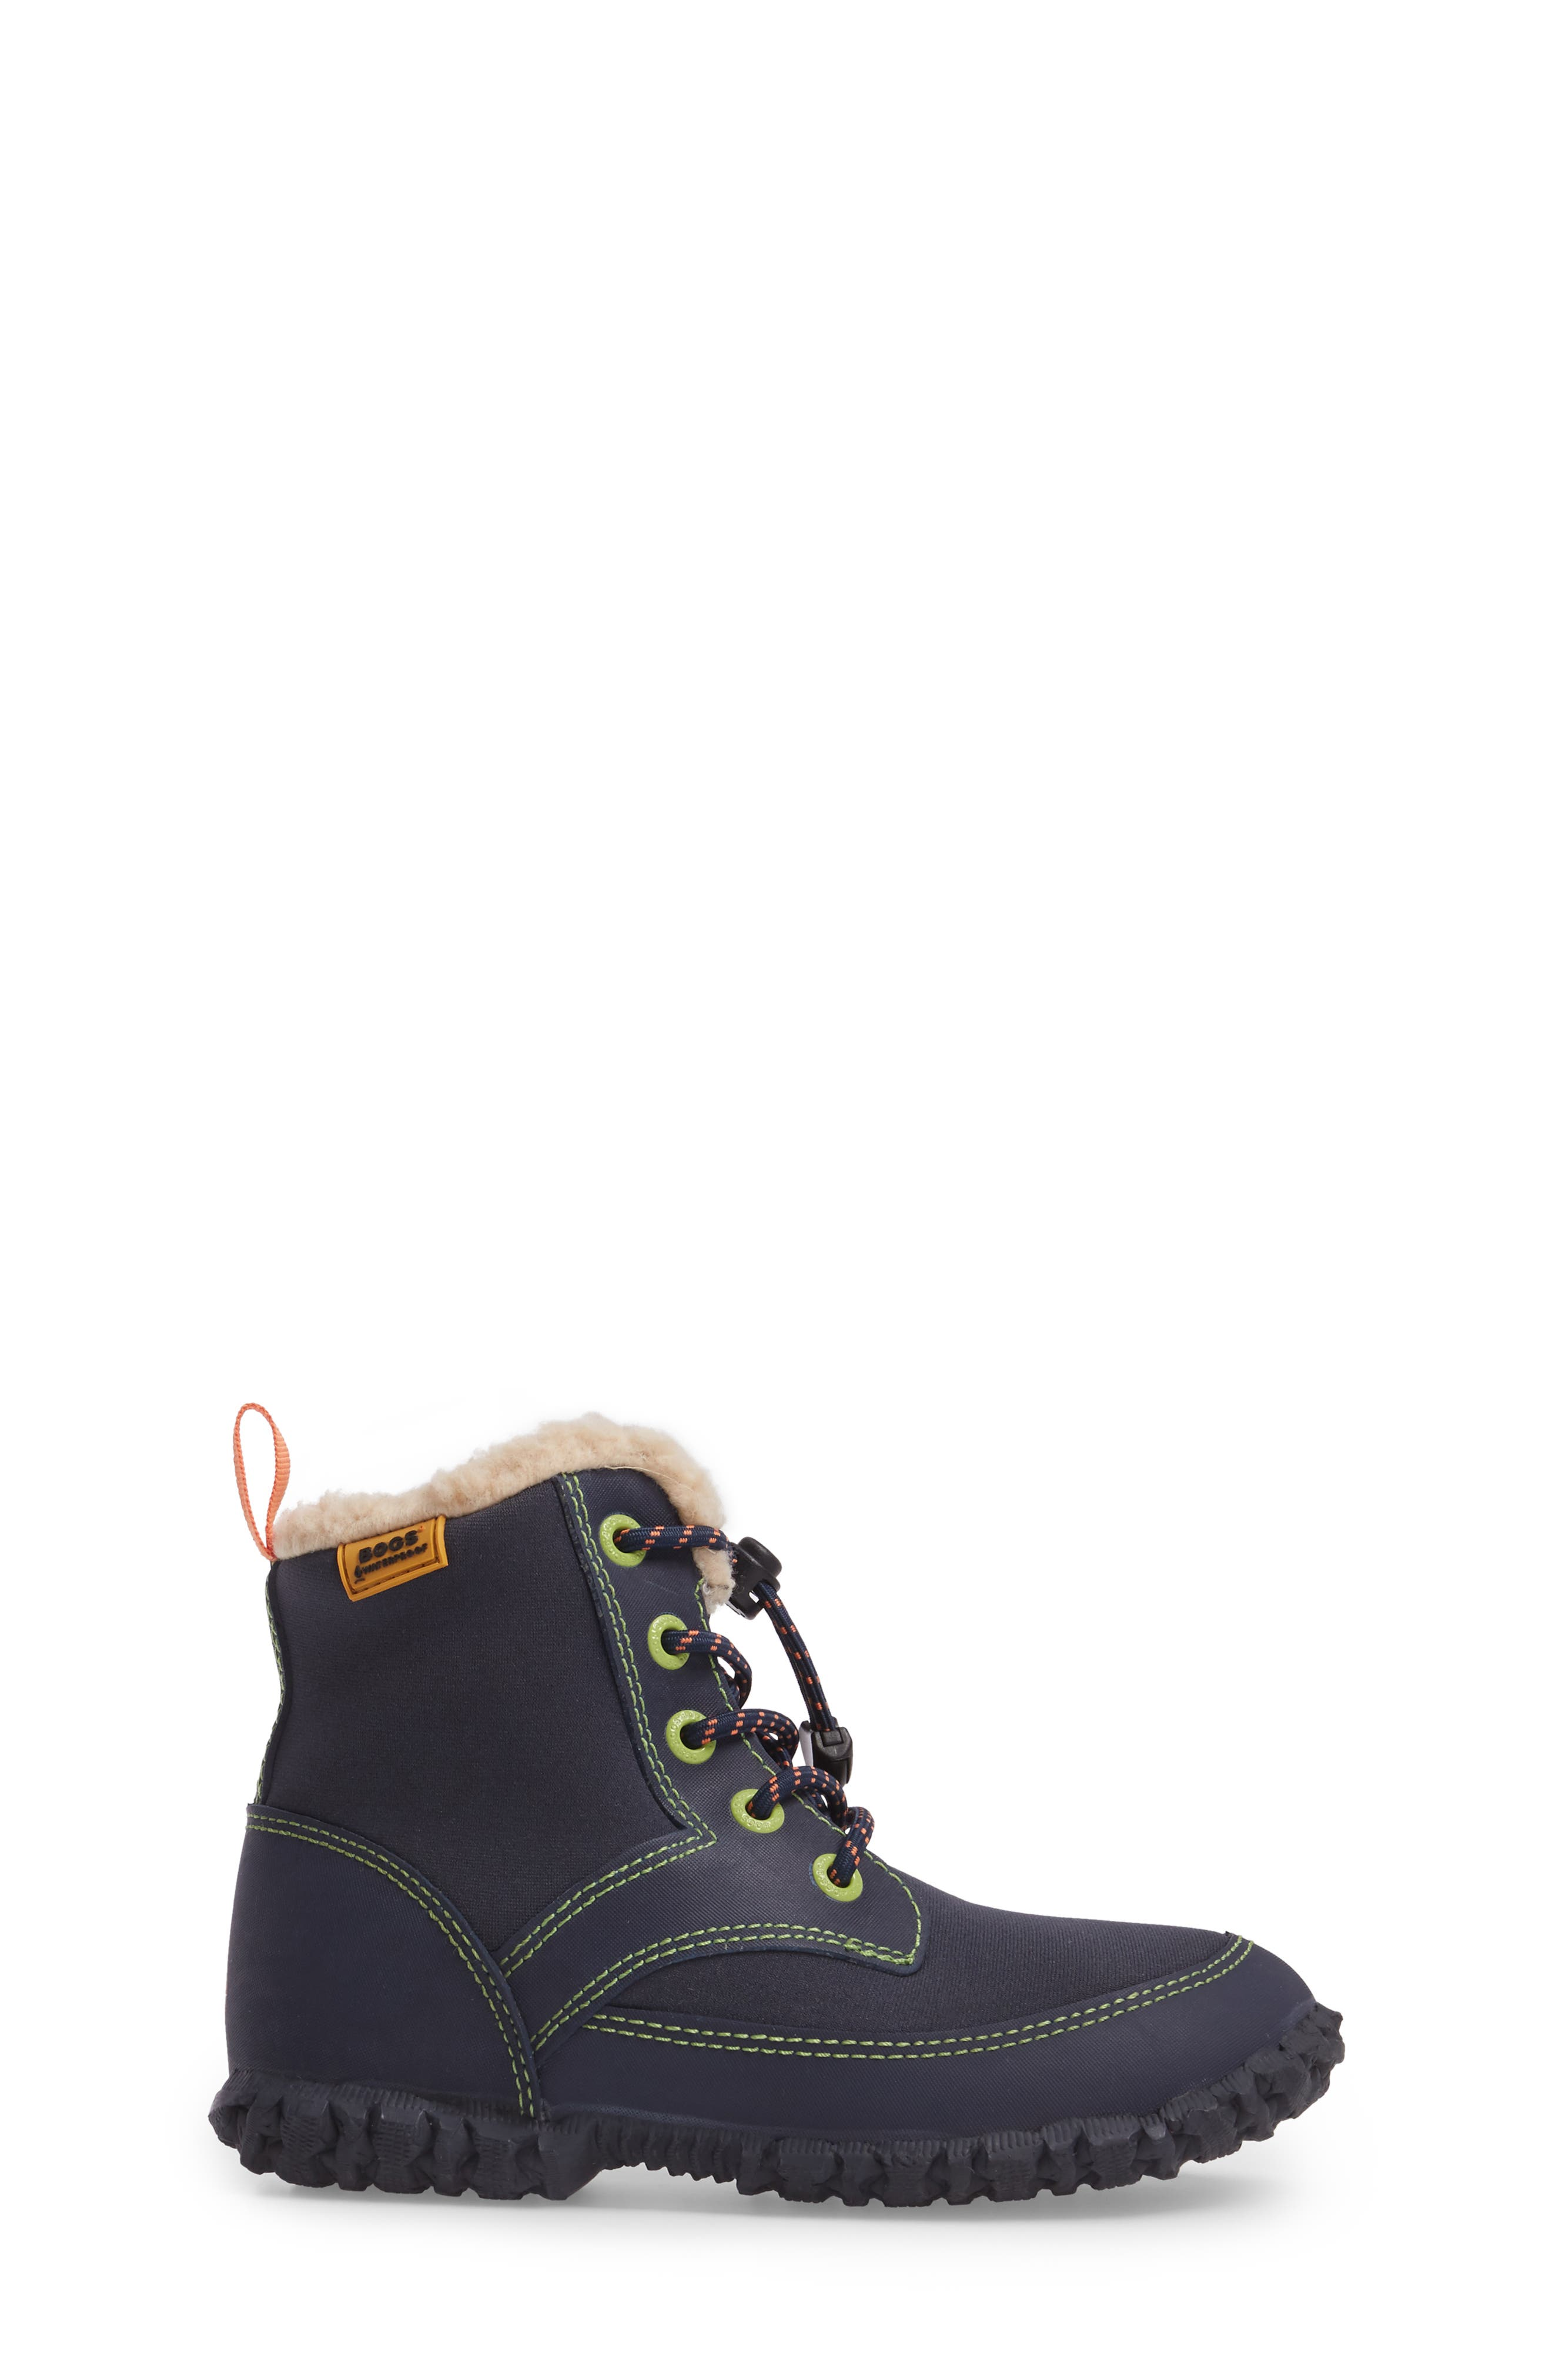 Skyler Faux Fur Insulated Waterproof Boot,                             Alternate thumbnail 3, color,                             Dark Blue Multi